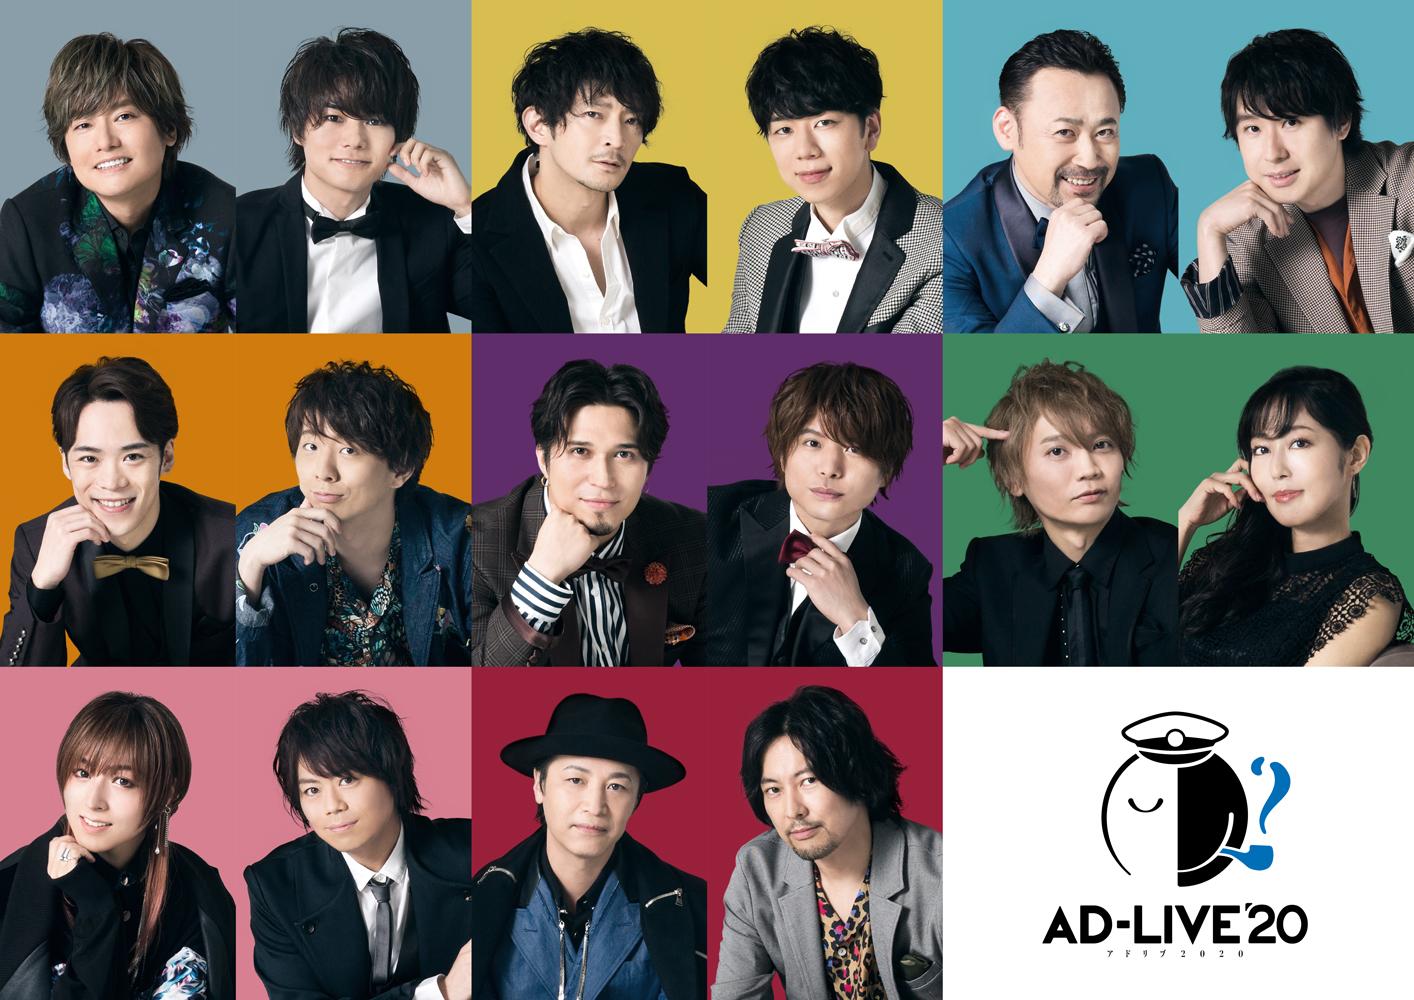 「AD-LIVE 2020」無観客ライブ配信に変更し実施へ!鈴村健一さんからのメッセージも到着